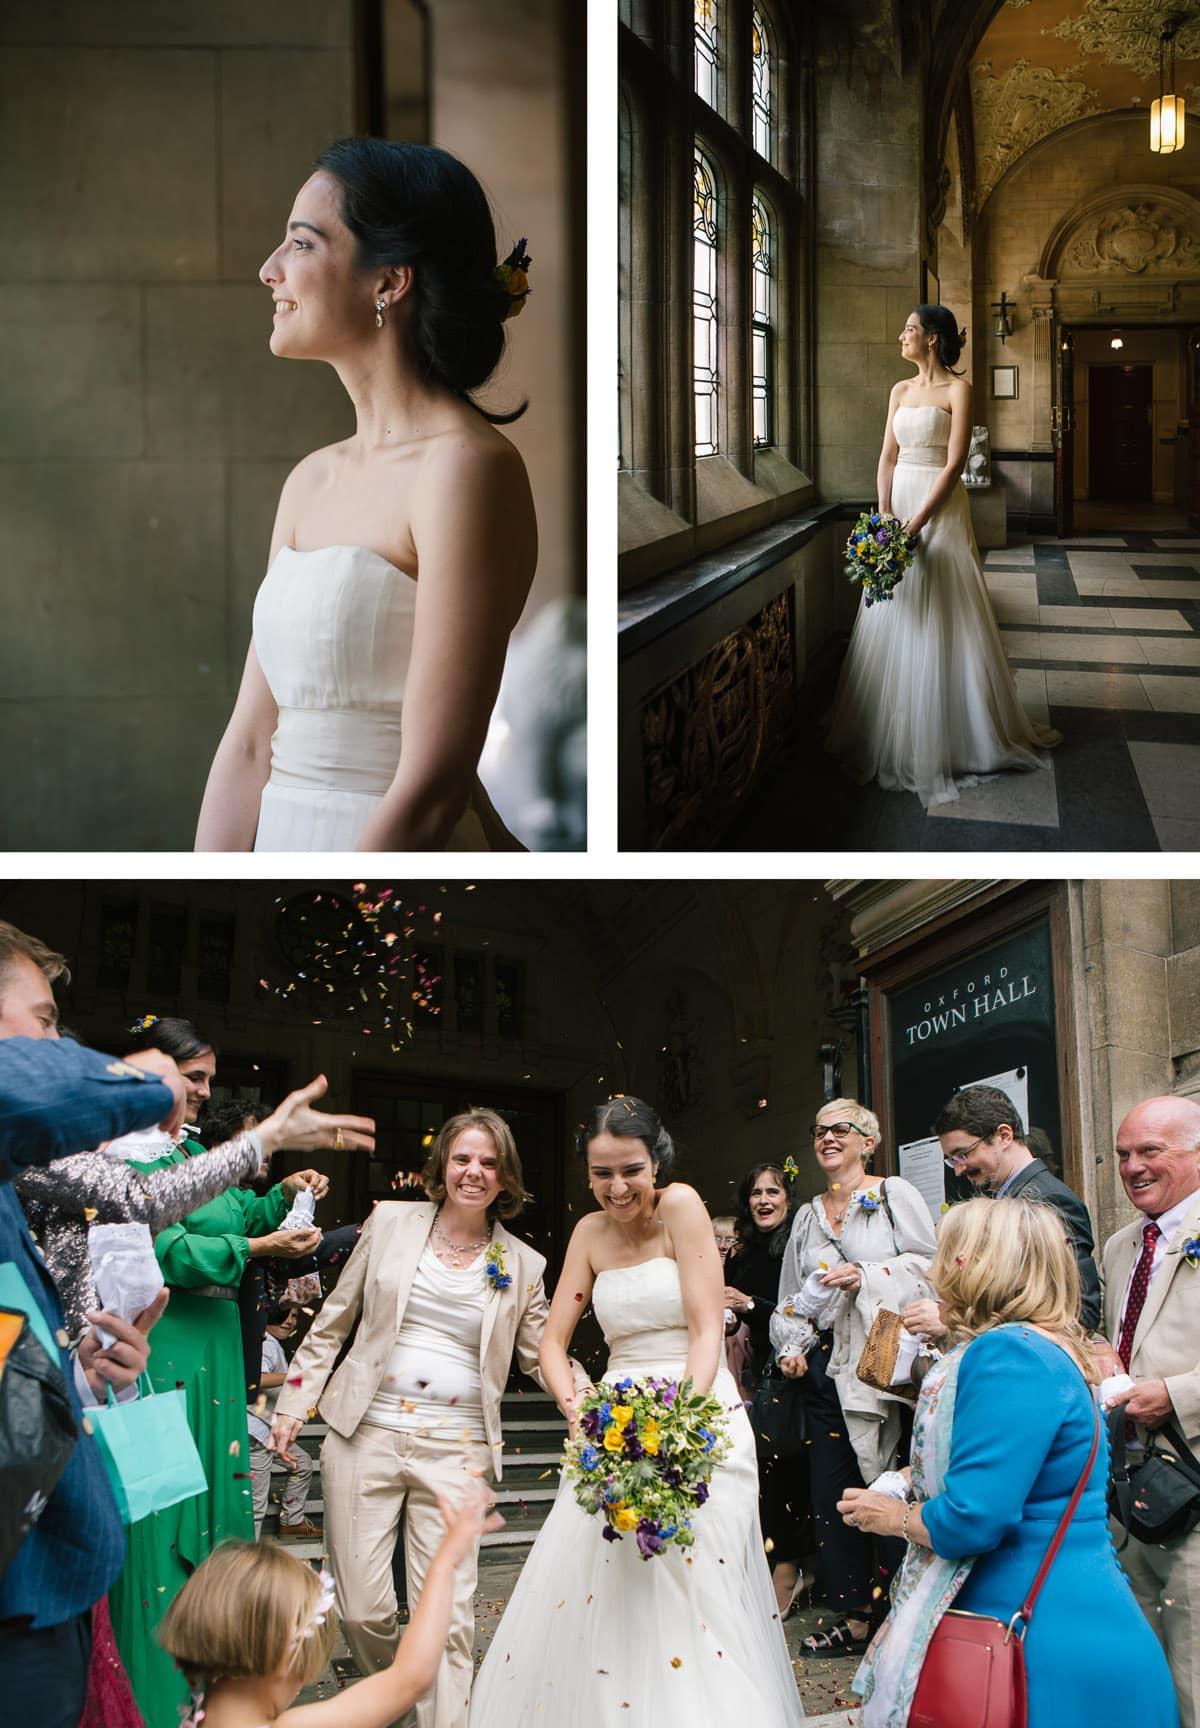 Bridal portraits and confetti shot at Oxford Town Hall